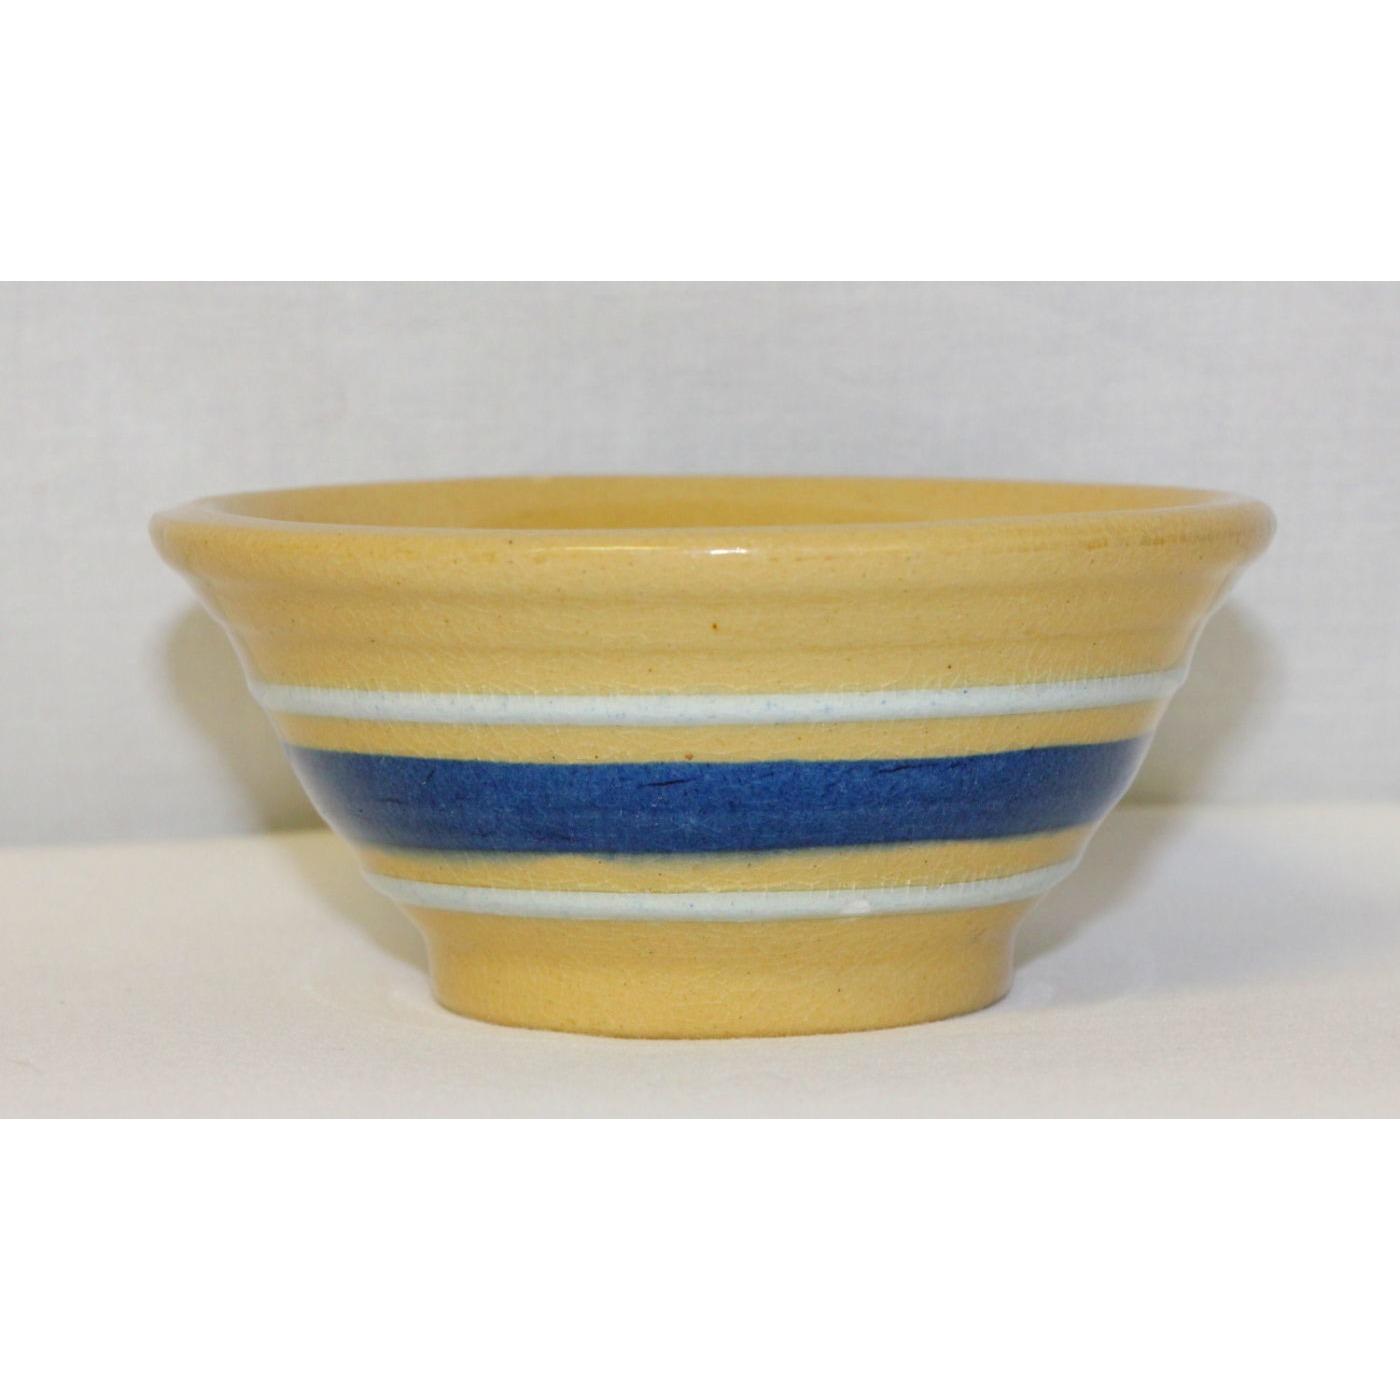 "4.5"" Rare Small Bowl w/ 2 Thin Blue Bands"